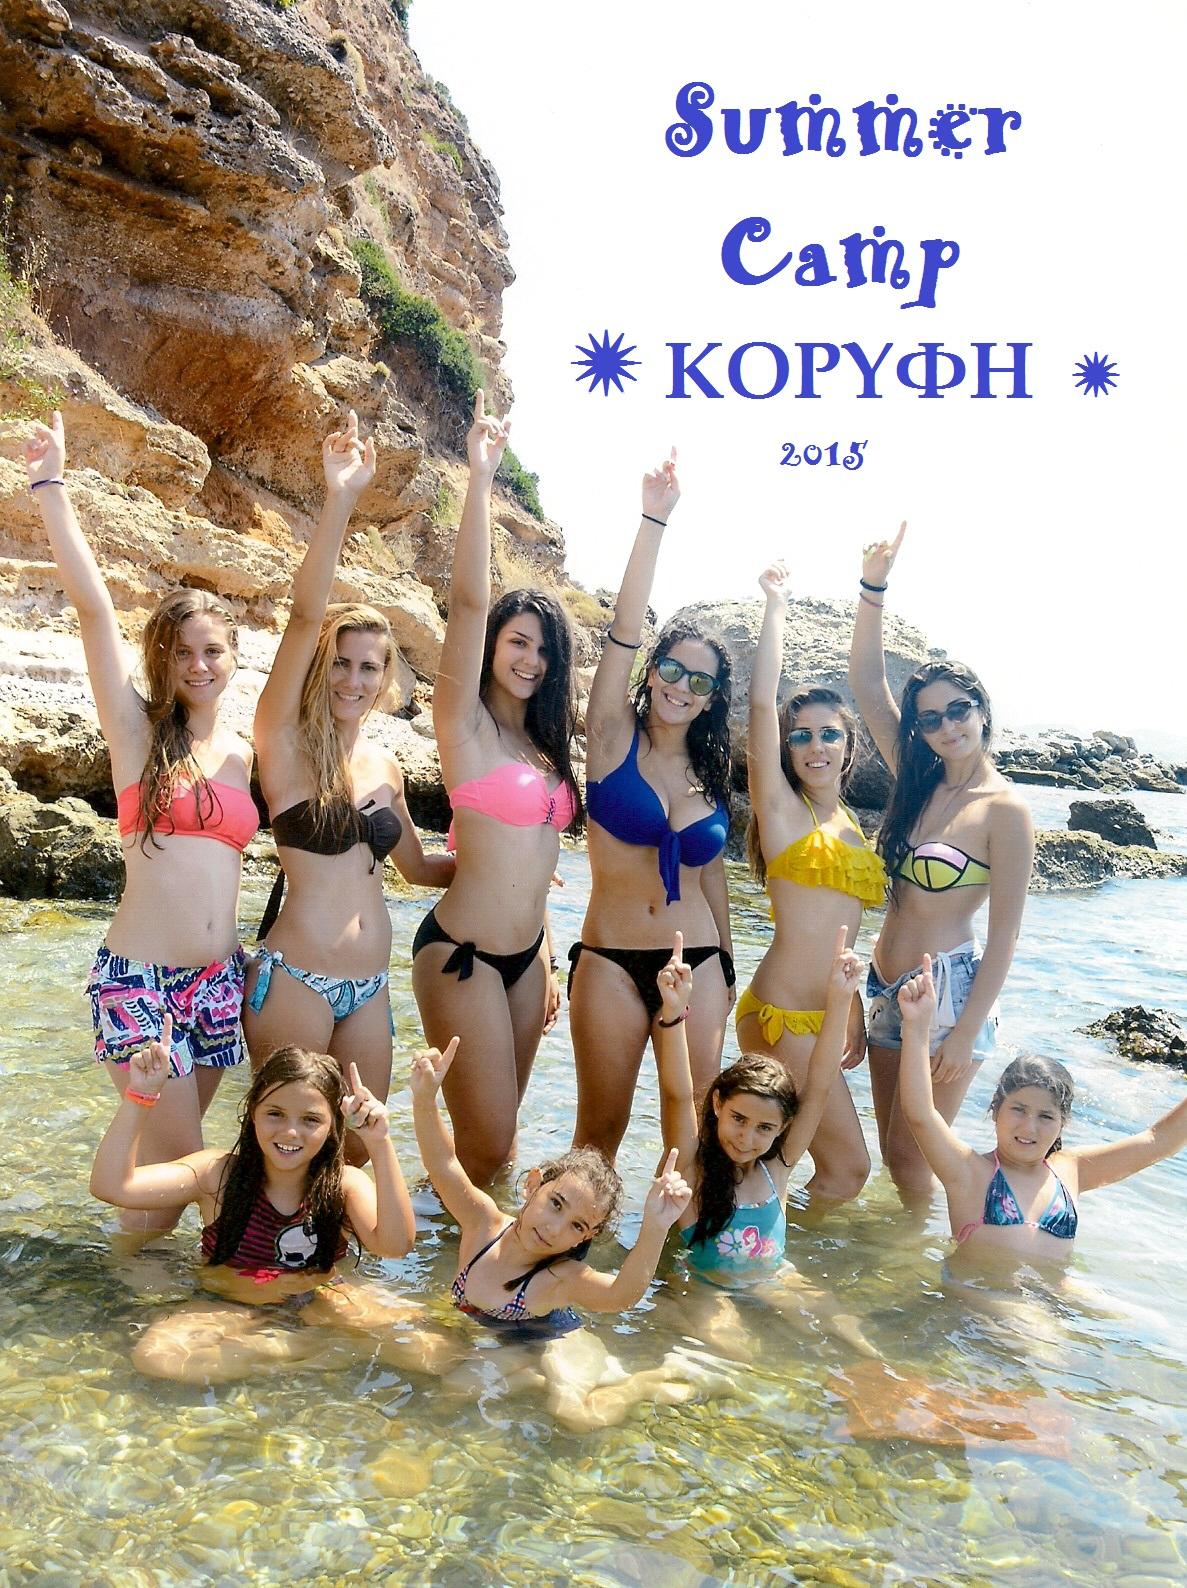 Summer Camp ΚΟΡΥΦΗ 2015